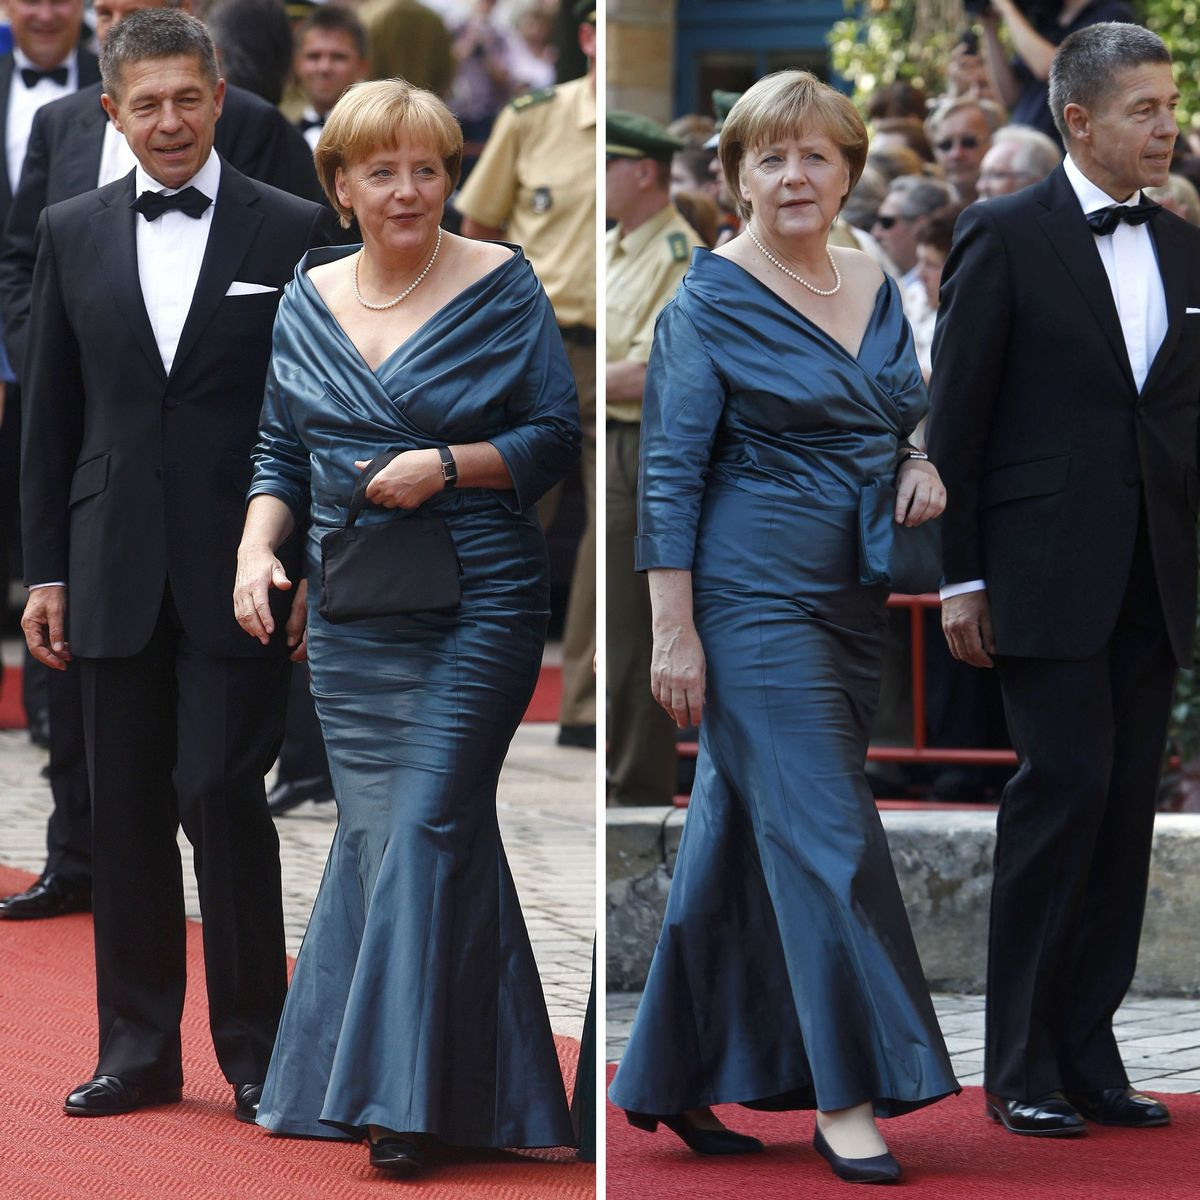 17 Kreativ Merkel Abendkleid Vertrieb10 Großartig Merkel Abendkleid Stylish